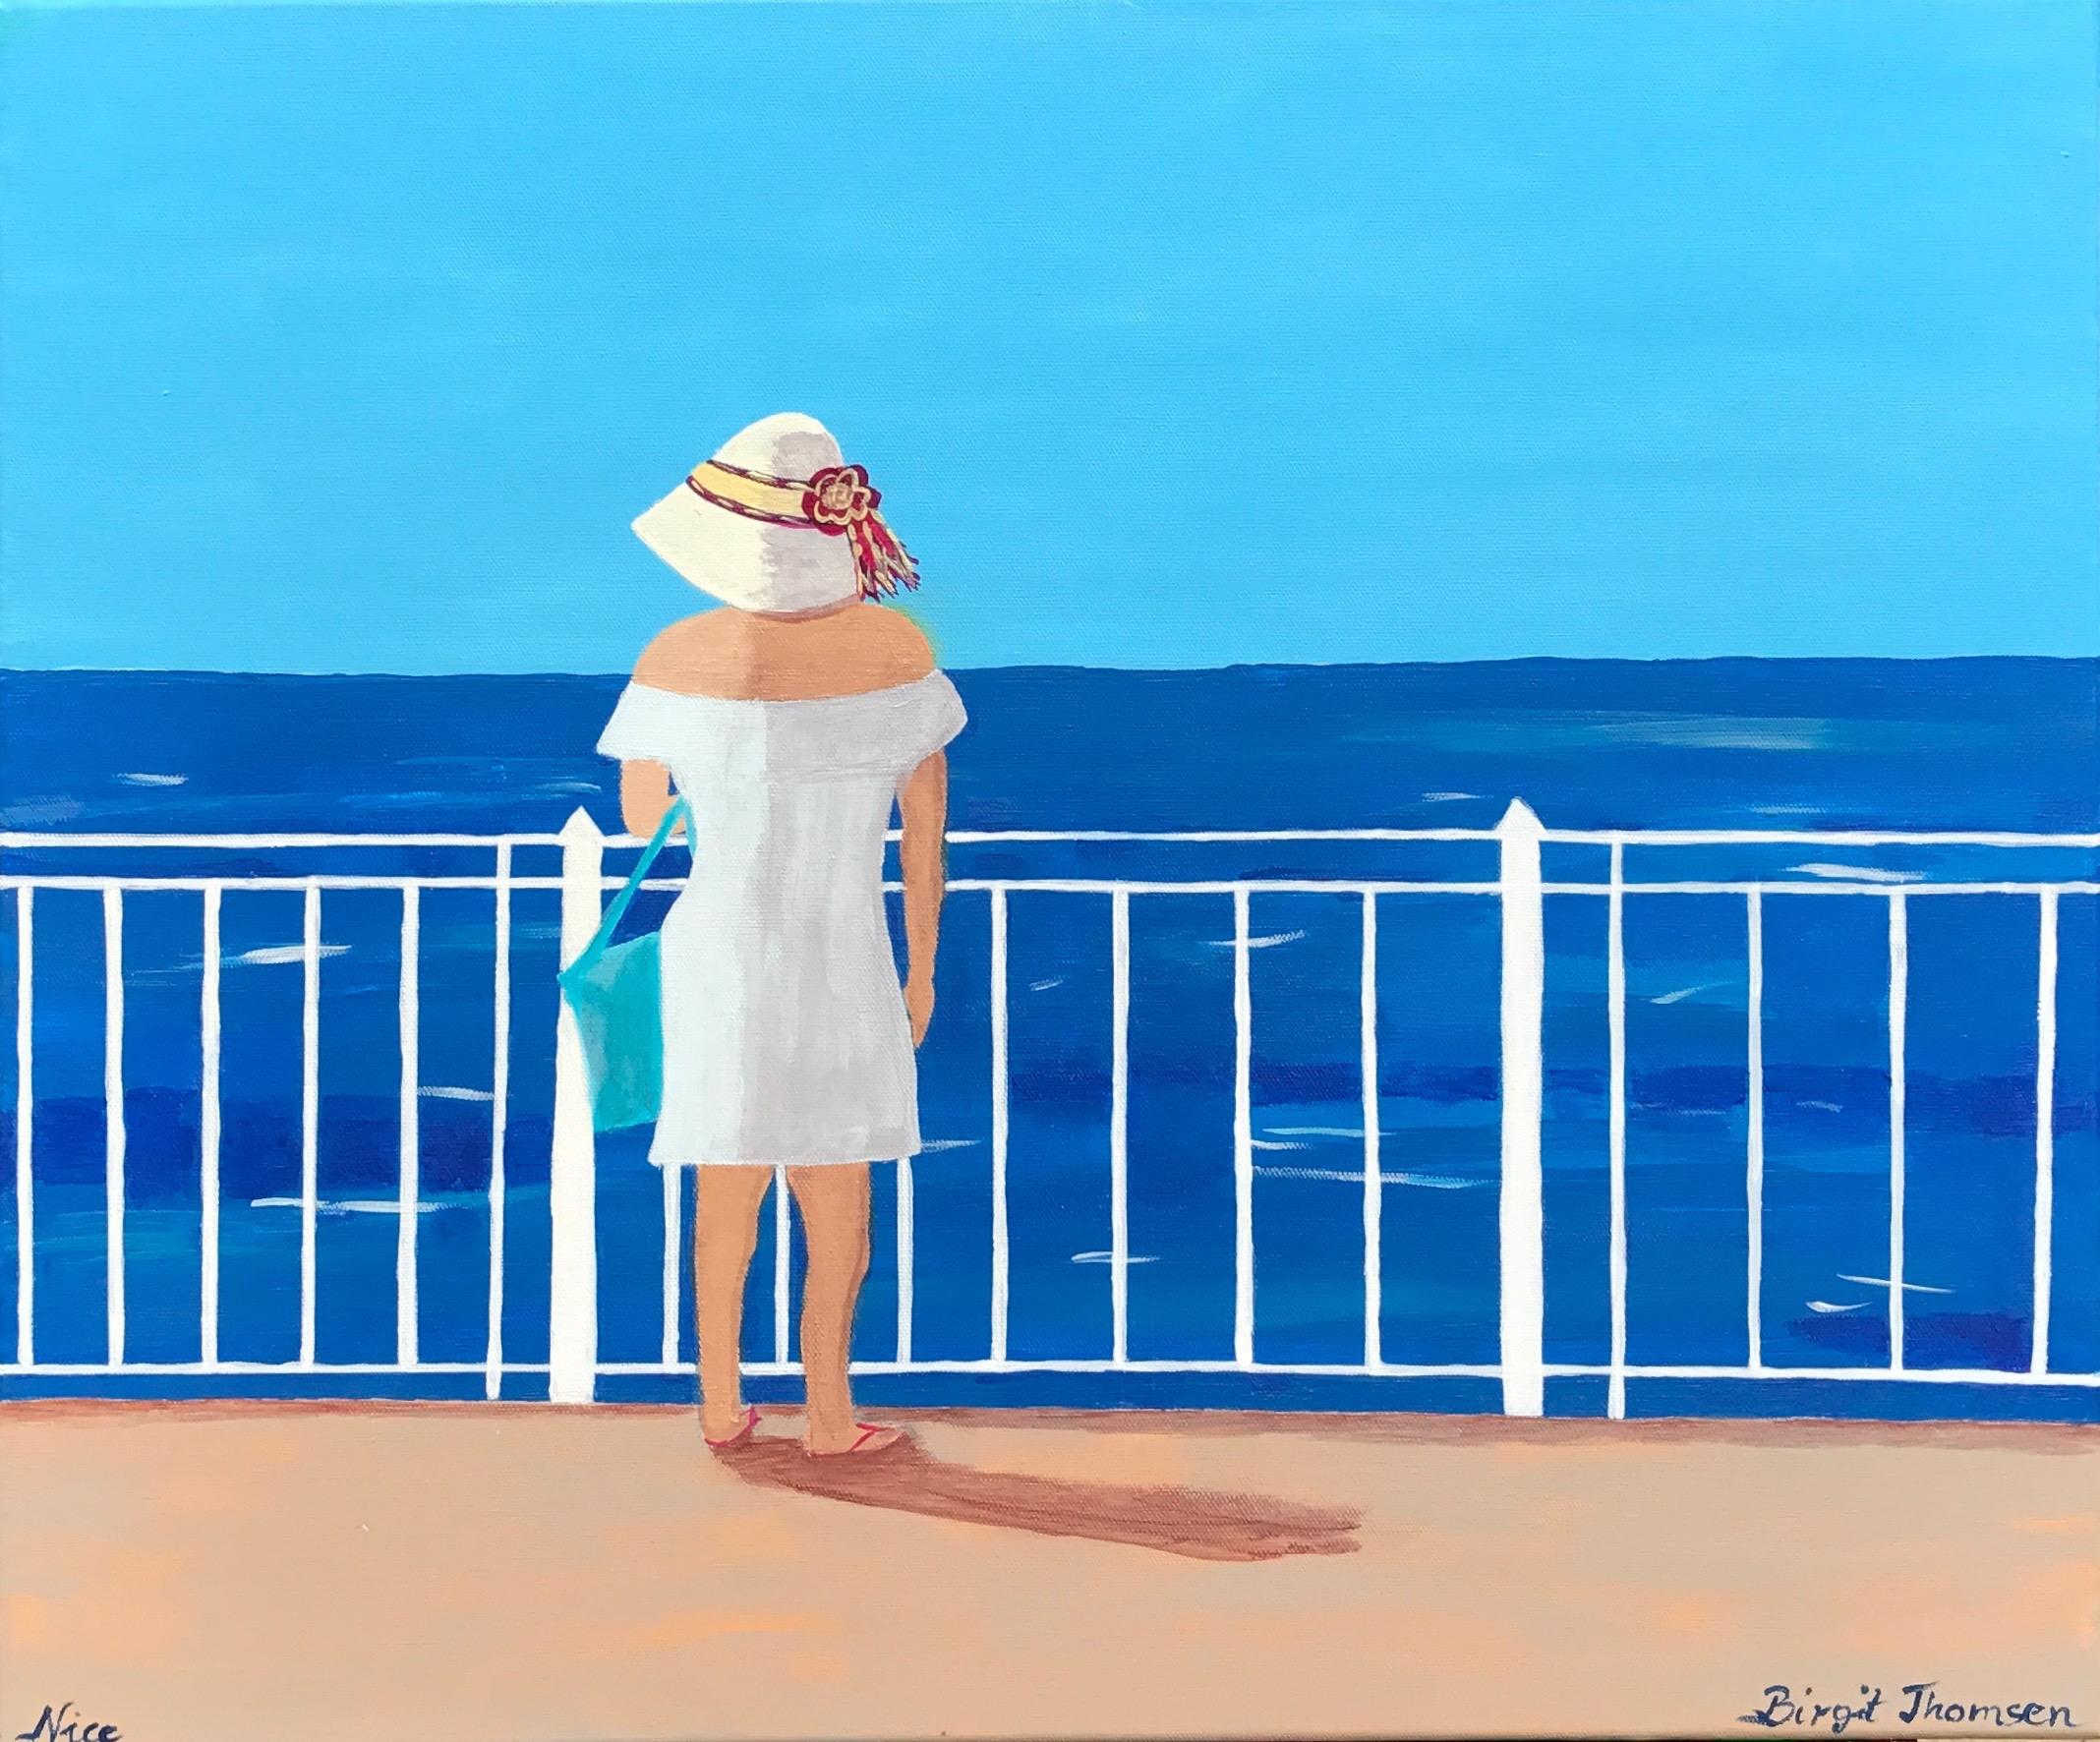 Lili in Nice